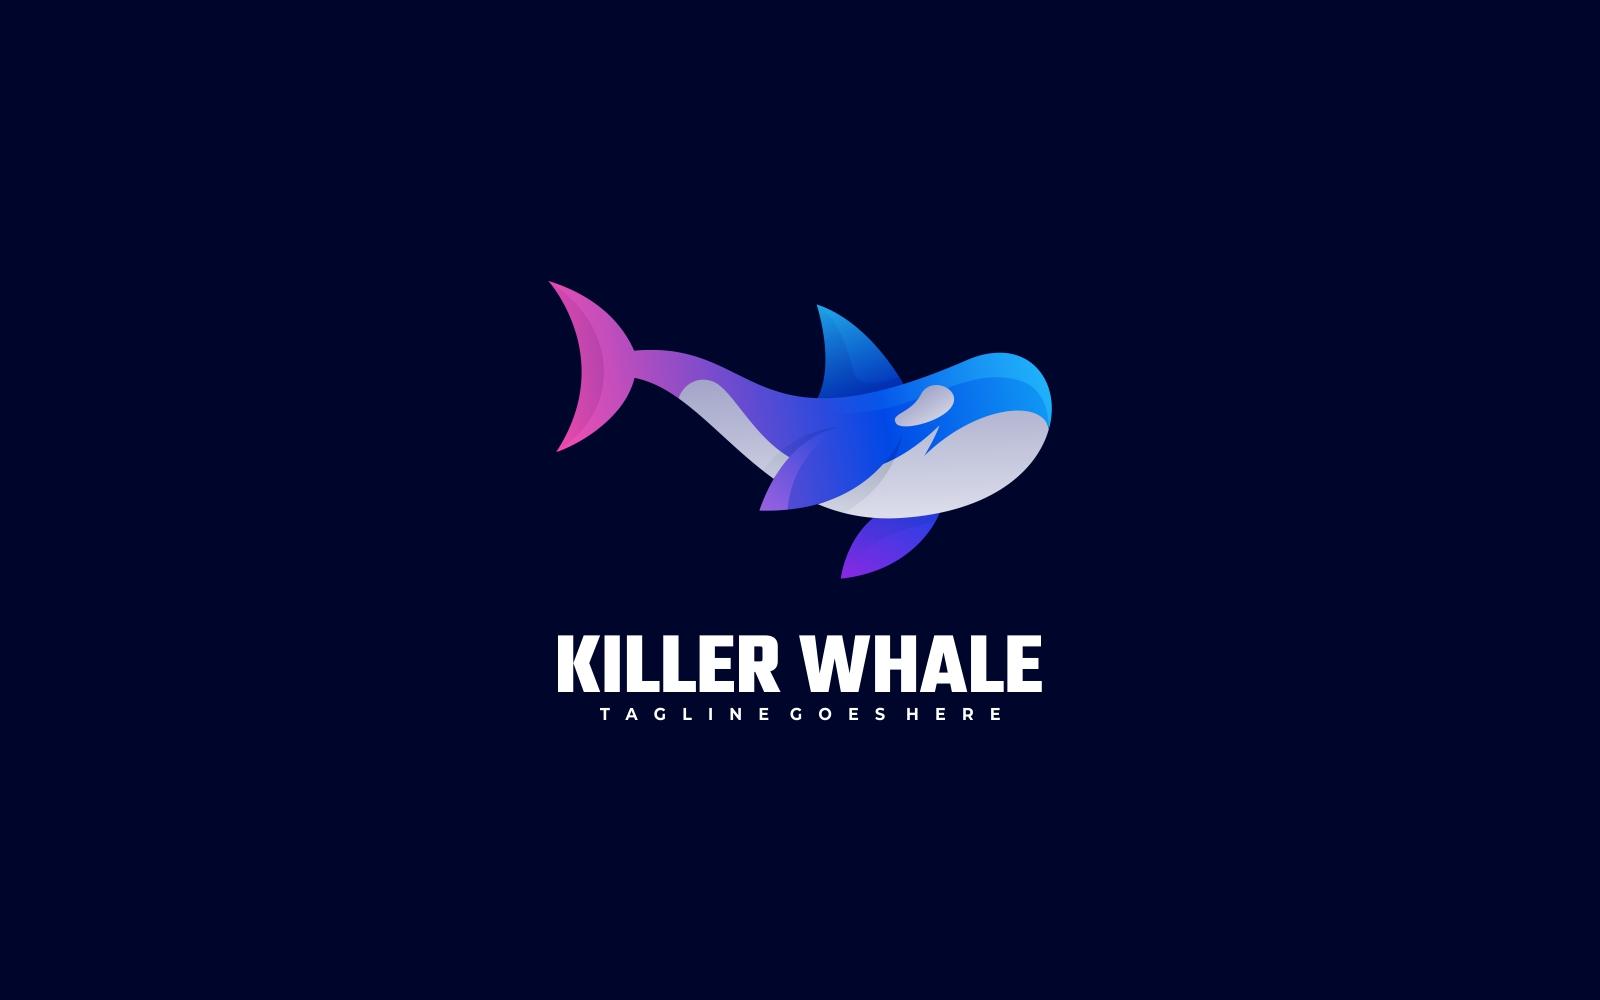 Creative Killer Whale 3D Gradient Logo - Pink, Purple and Blue